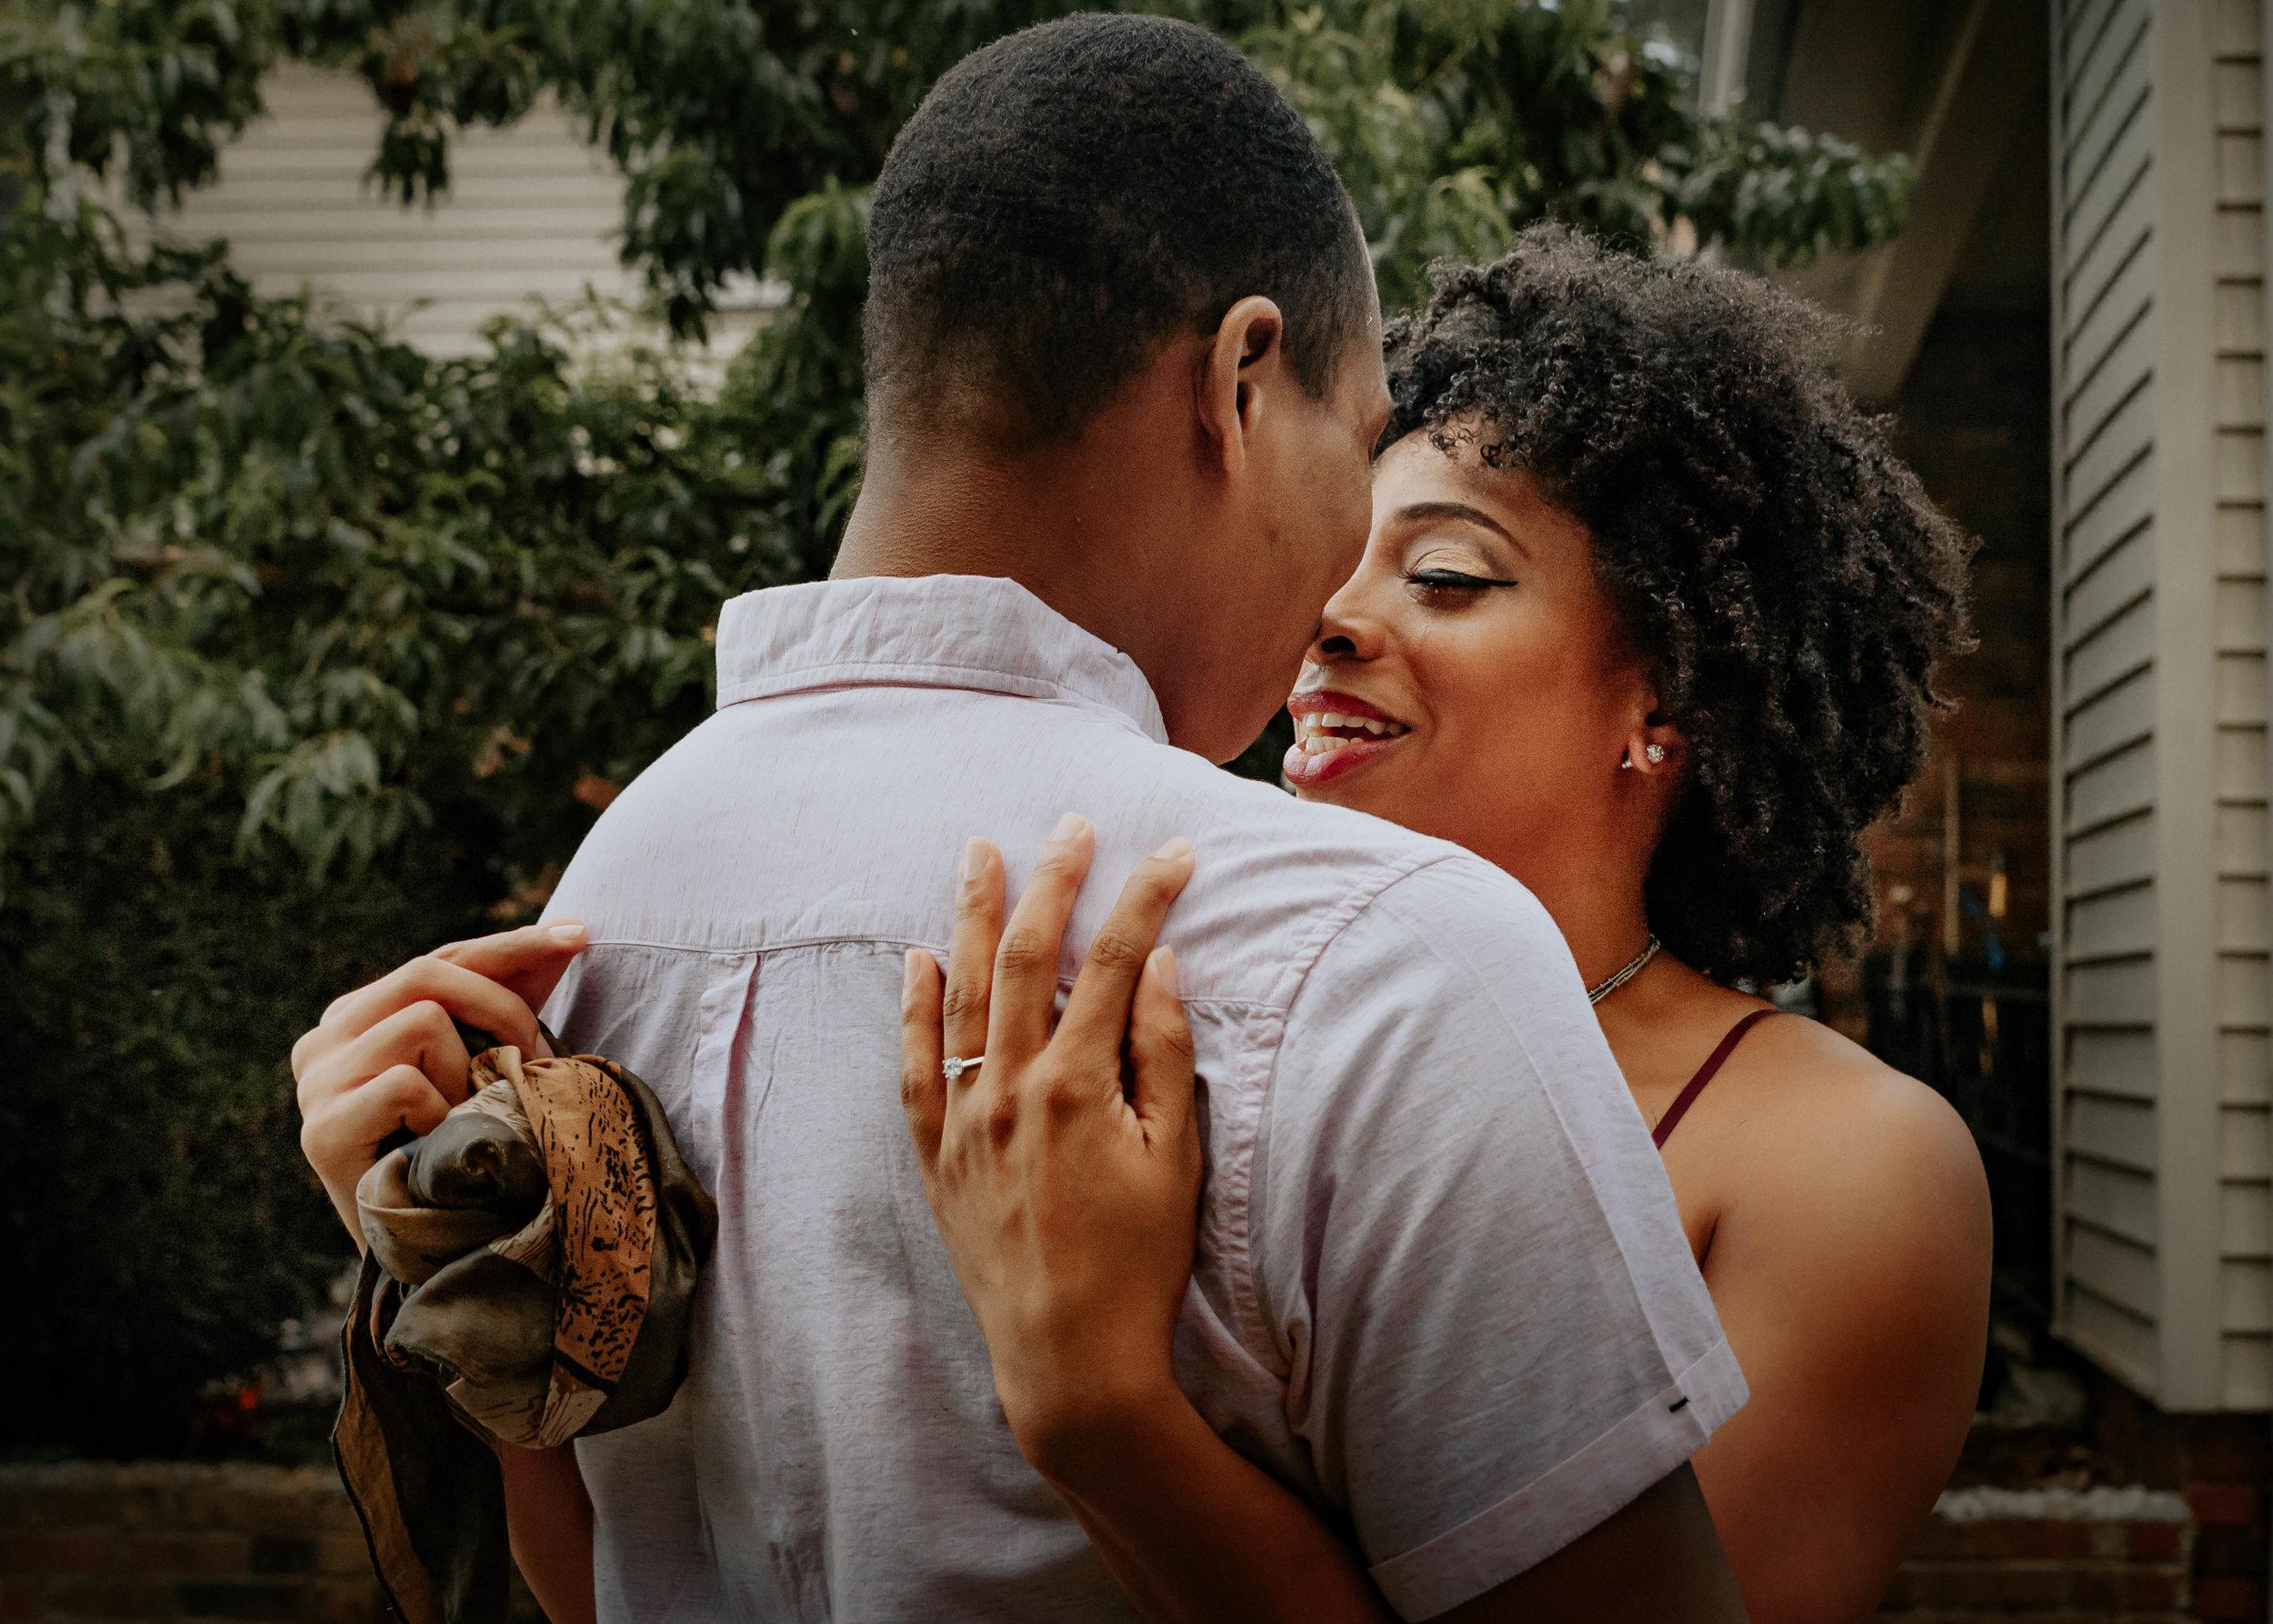 Aaron & Megan Proposal (Evans, GA)